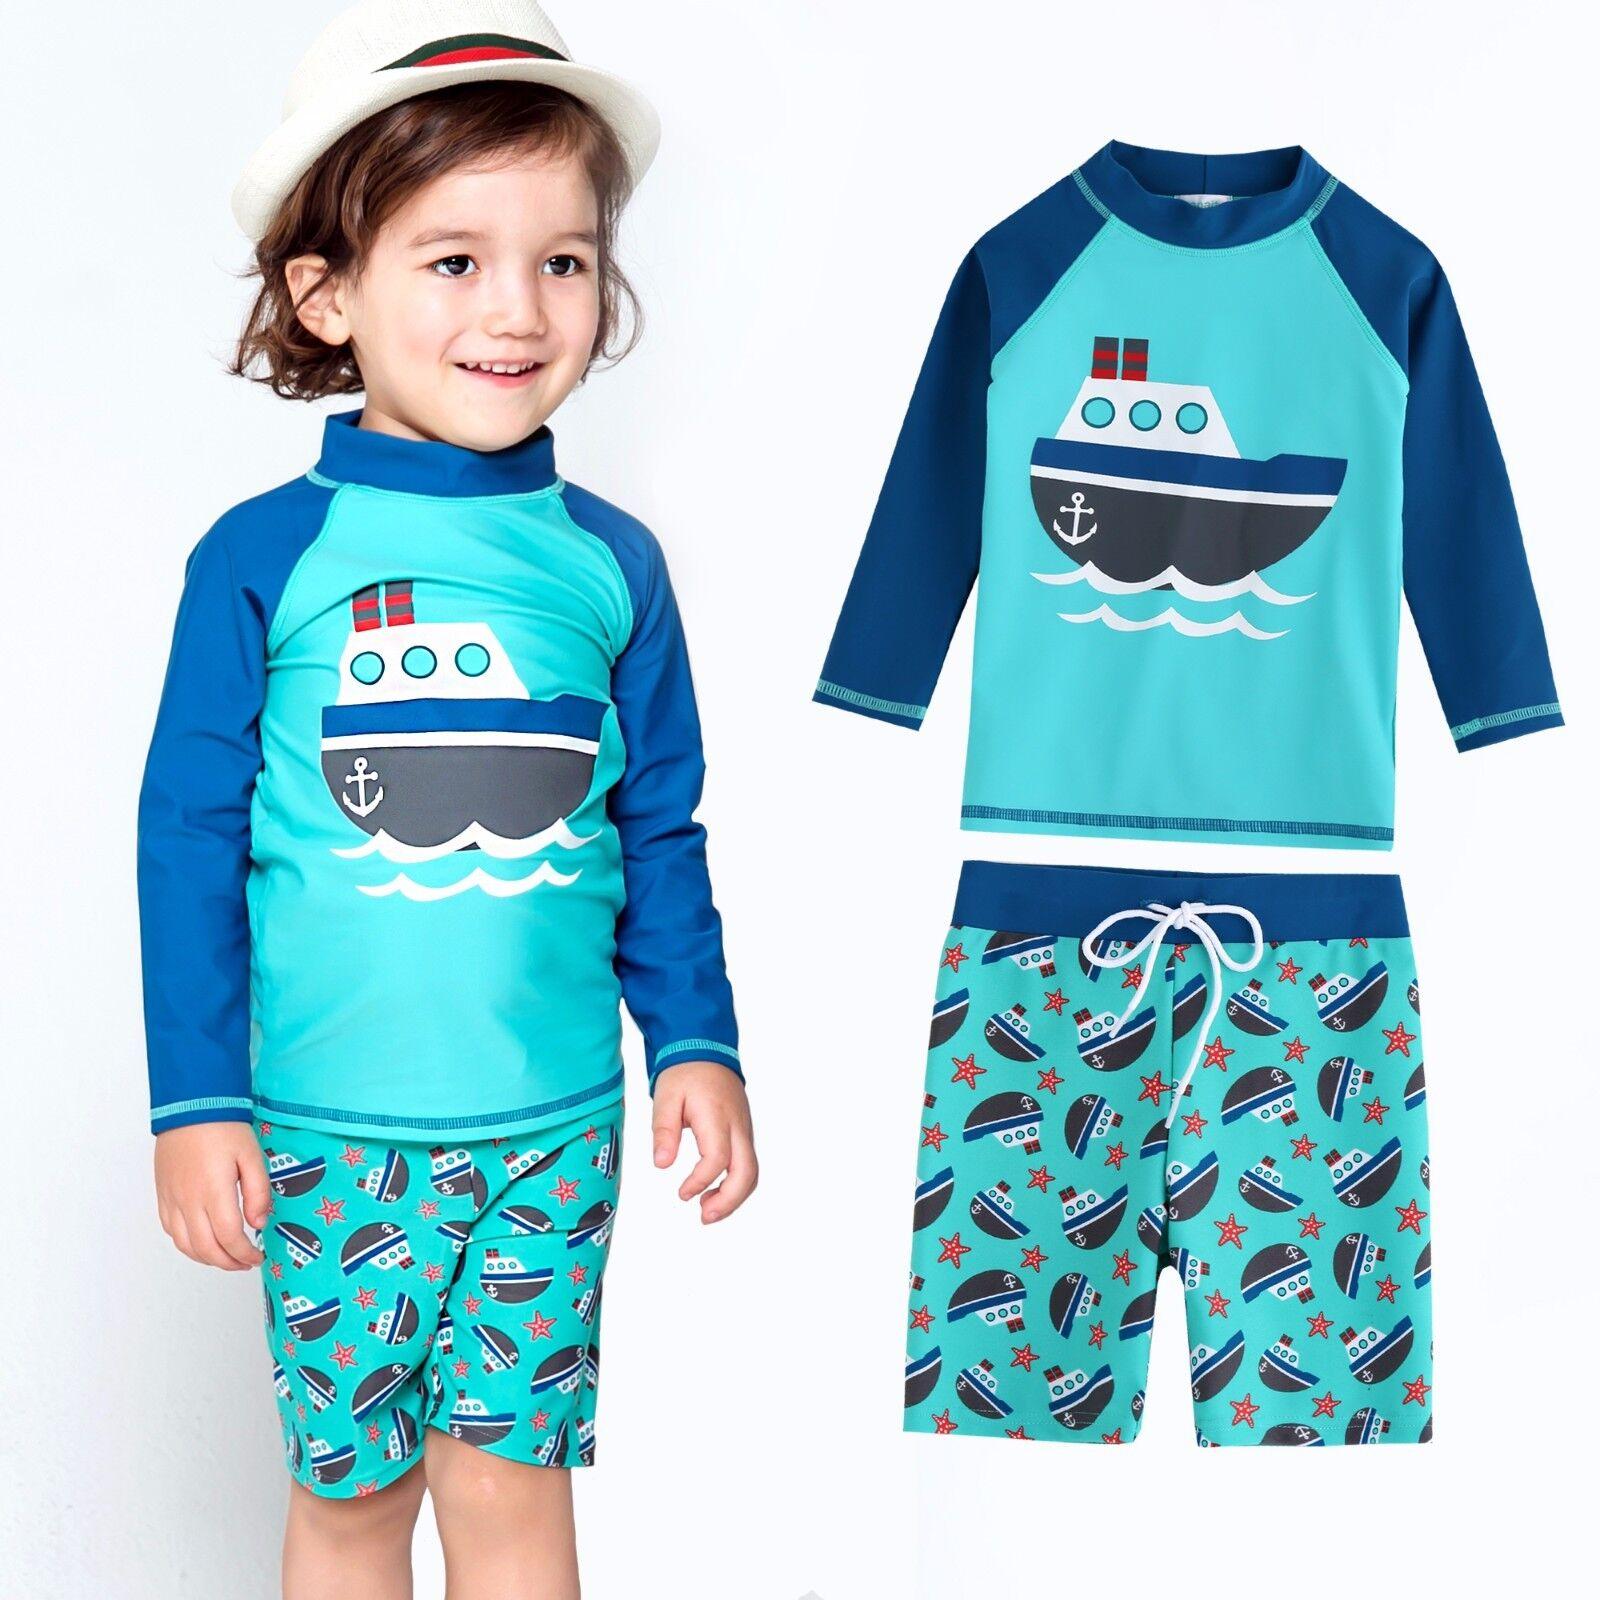 Vaenait baby Toddler UPF+50 Kids Boy Rashguard  Swimsuit Set